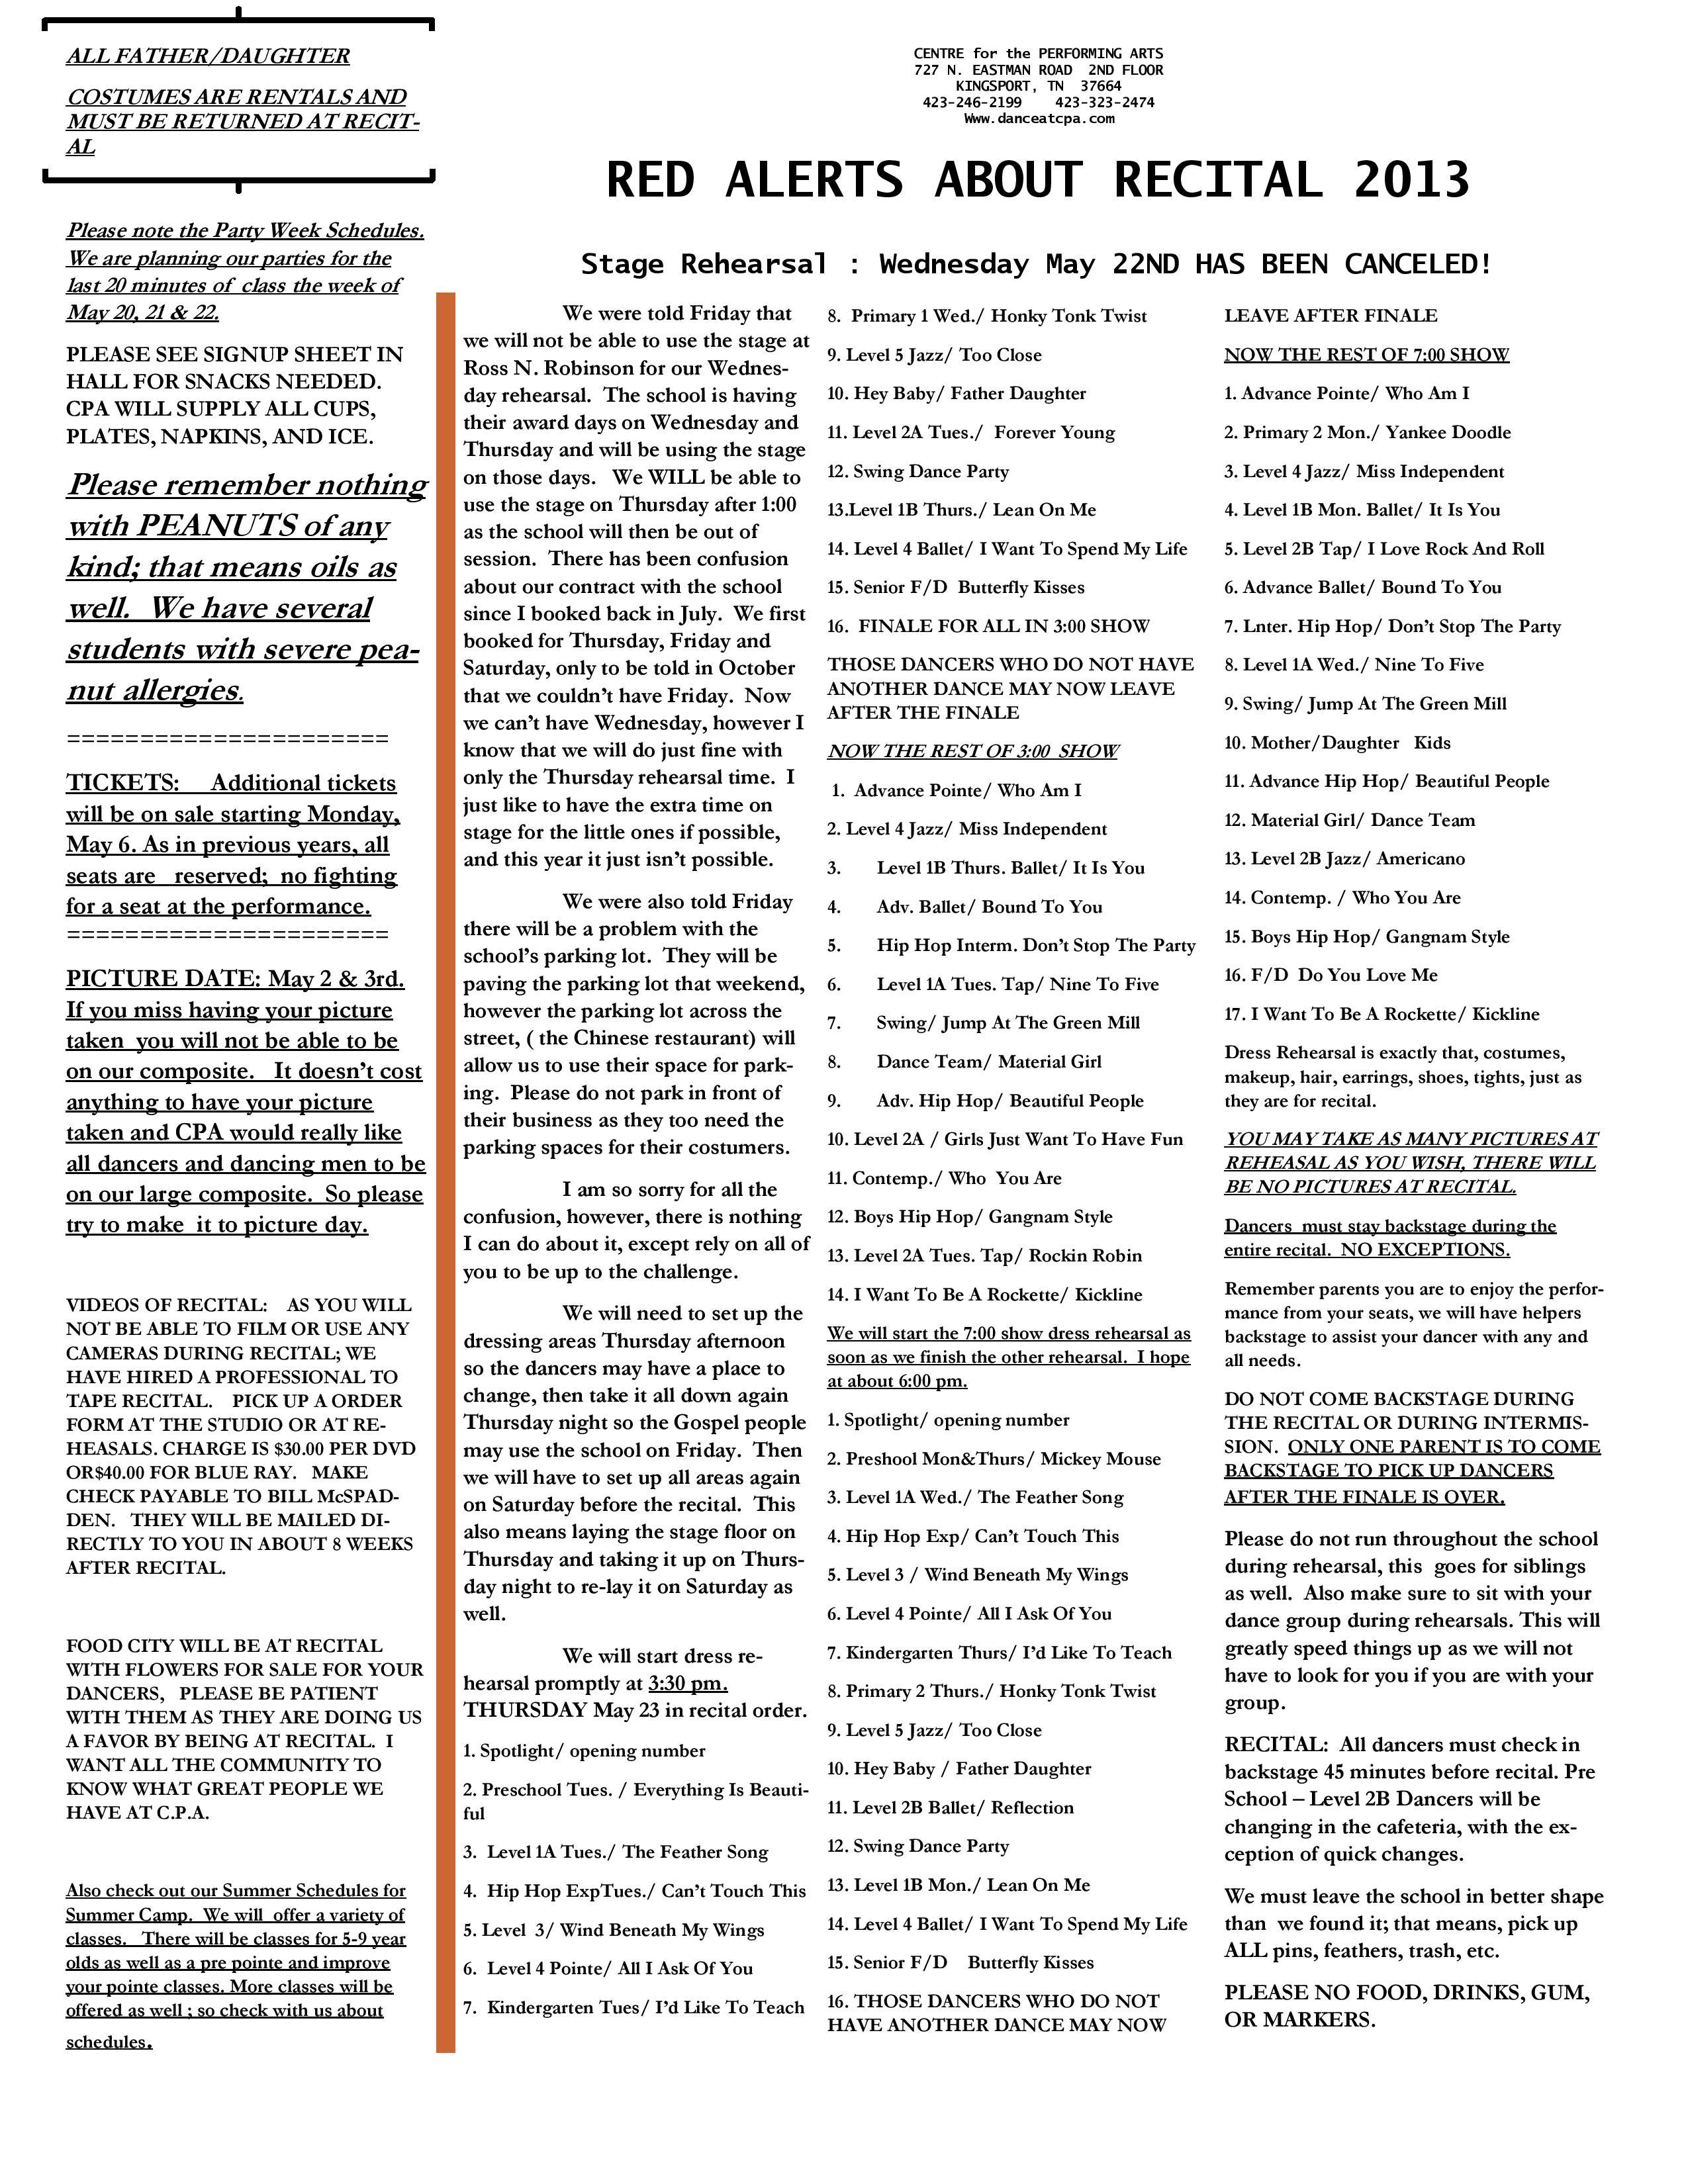 Red Alert Recital 2013-page-001